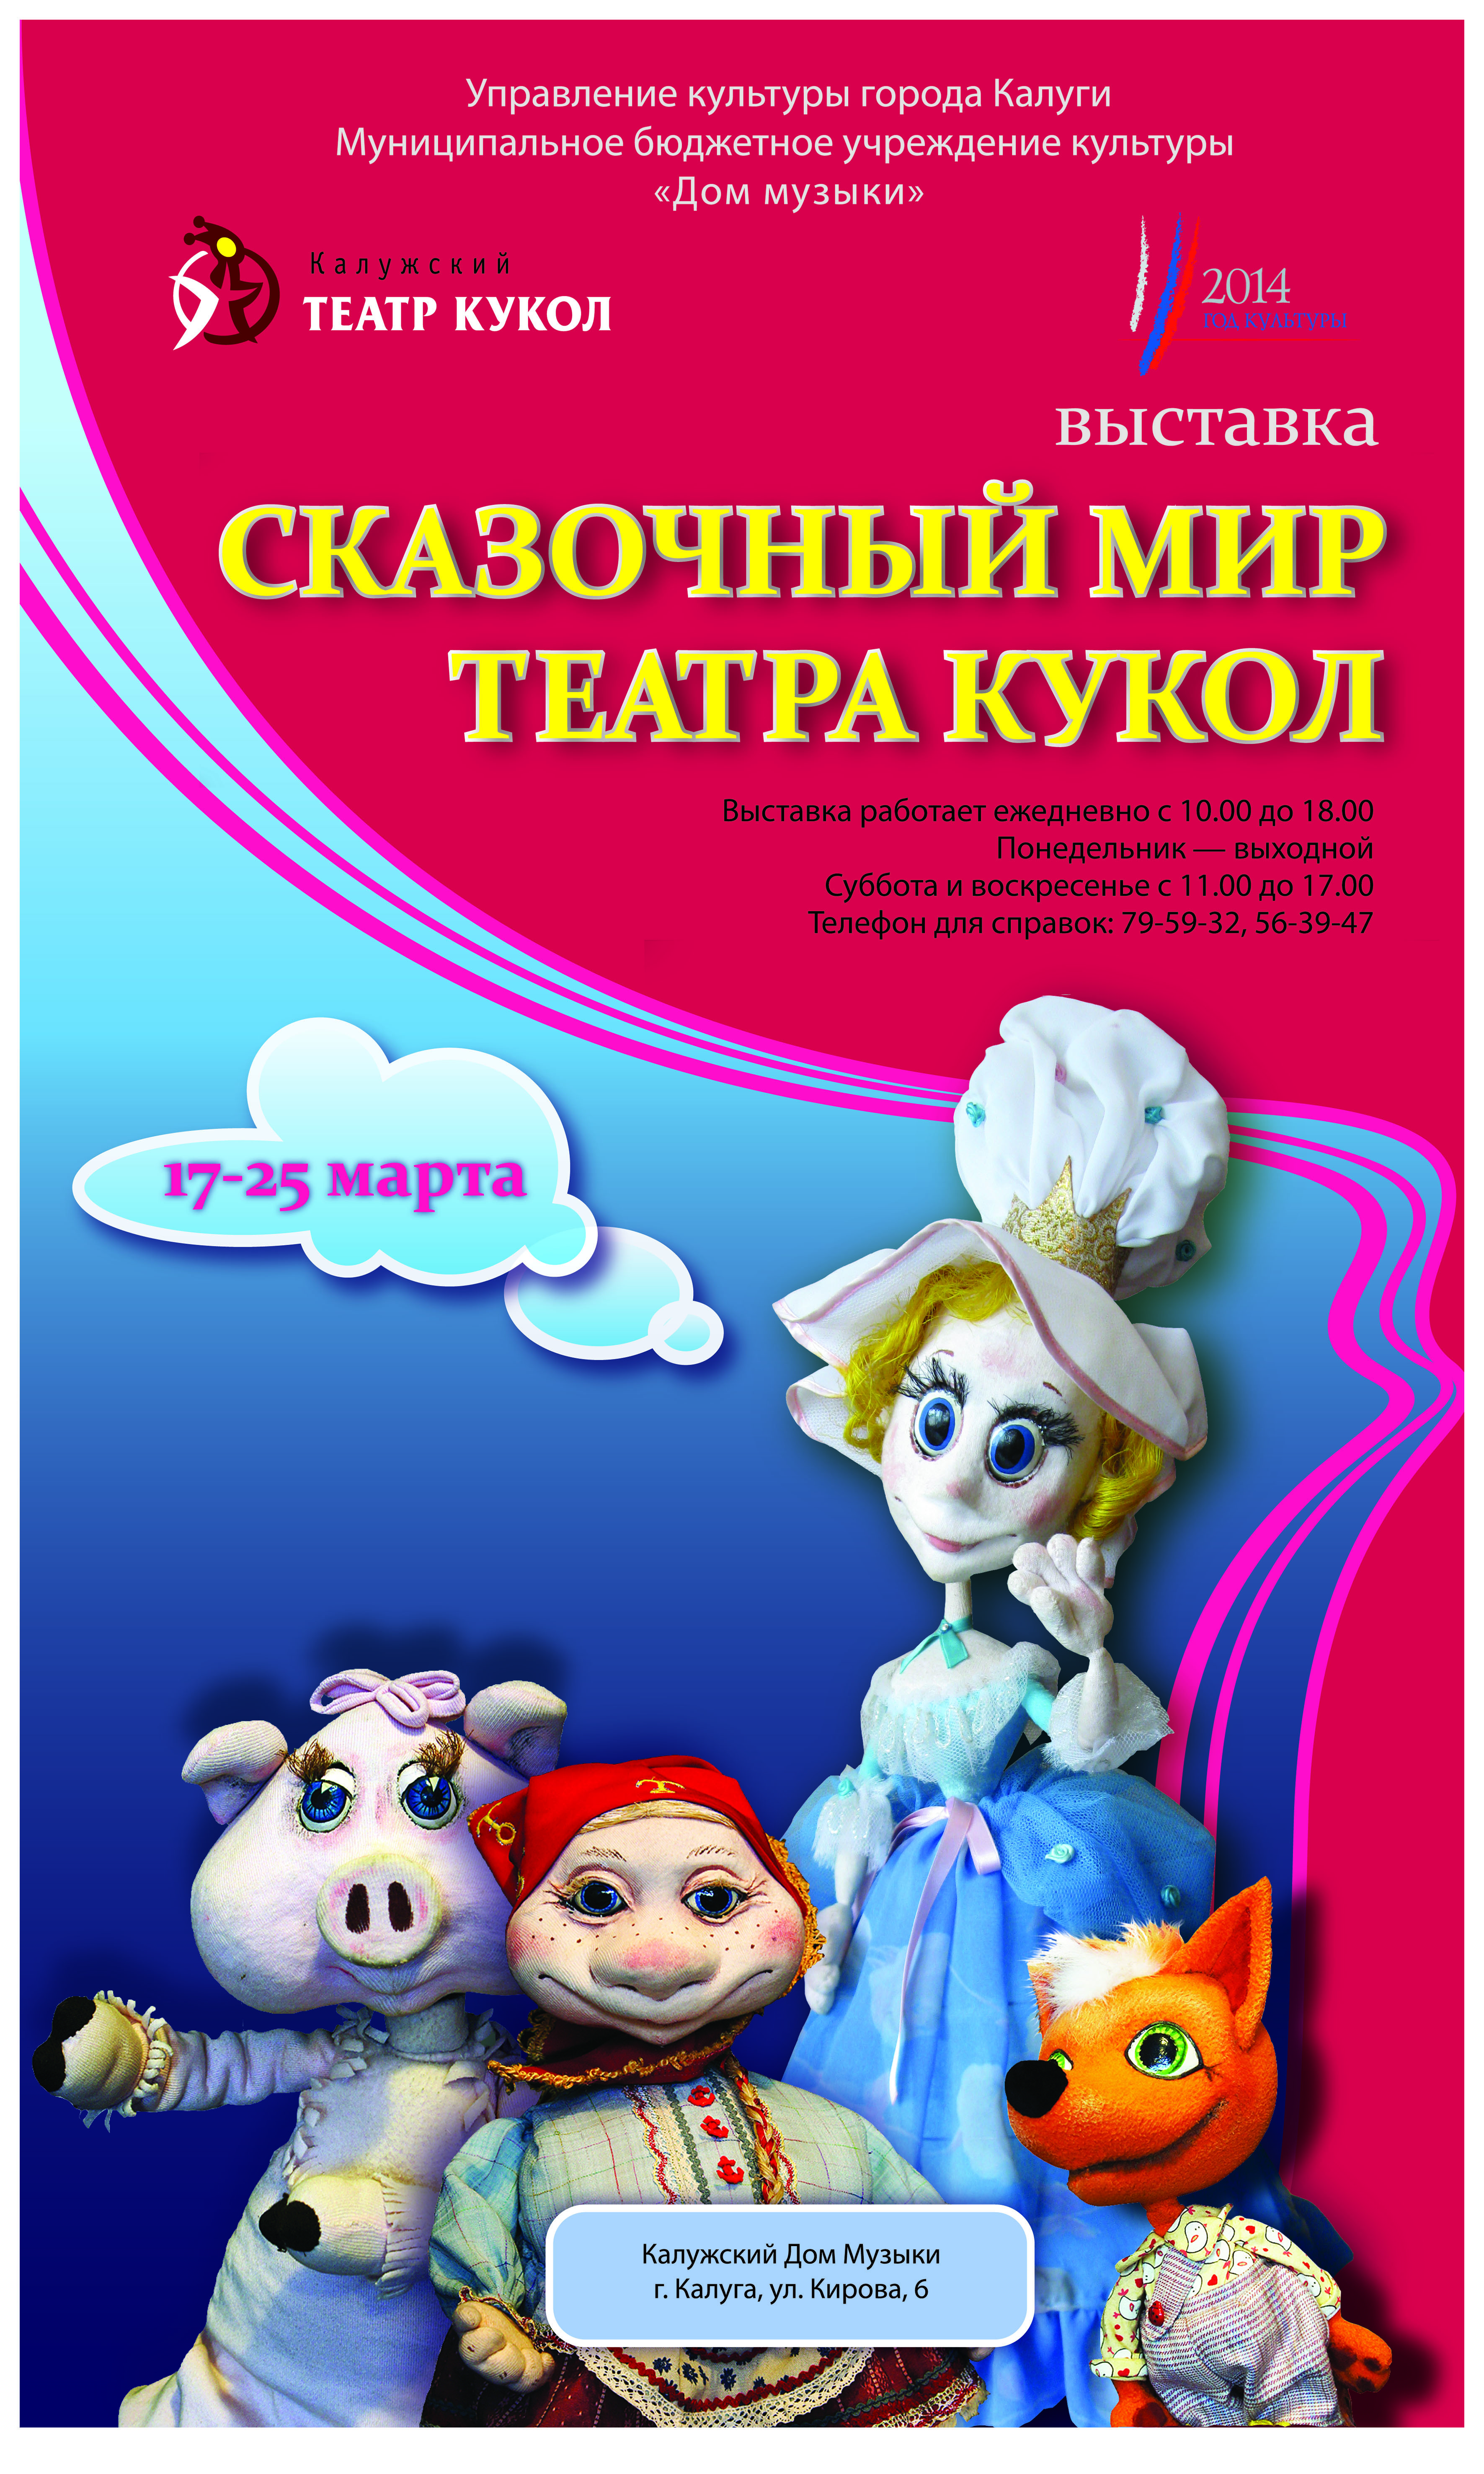 Мир театра кукол